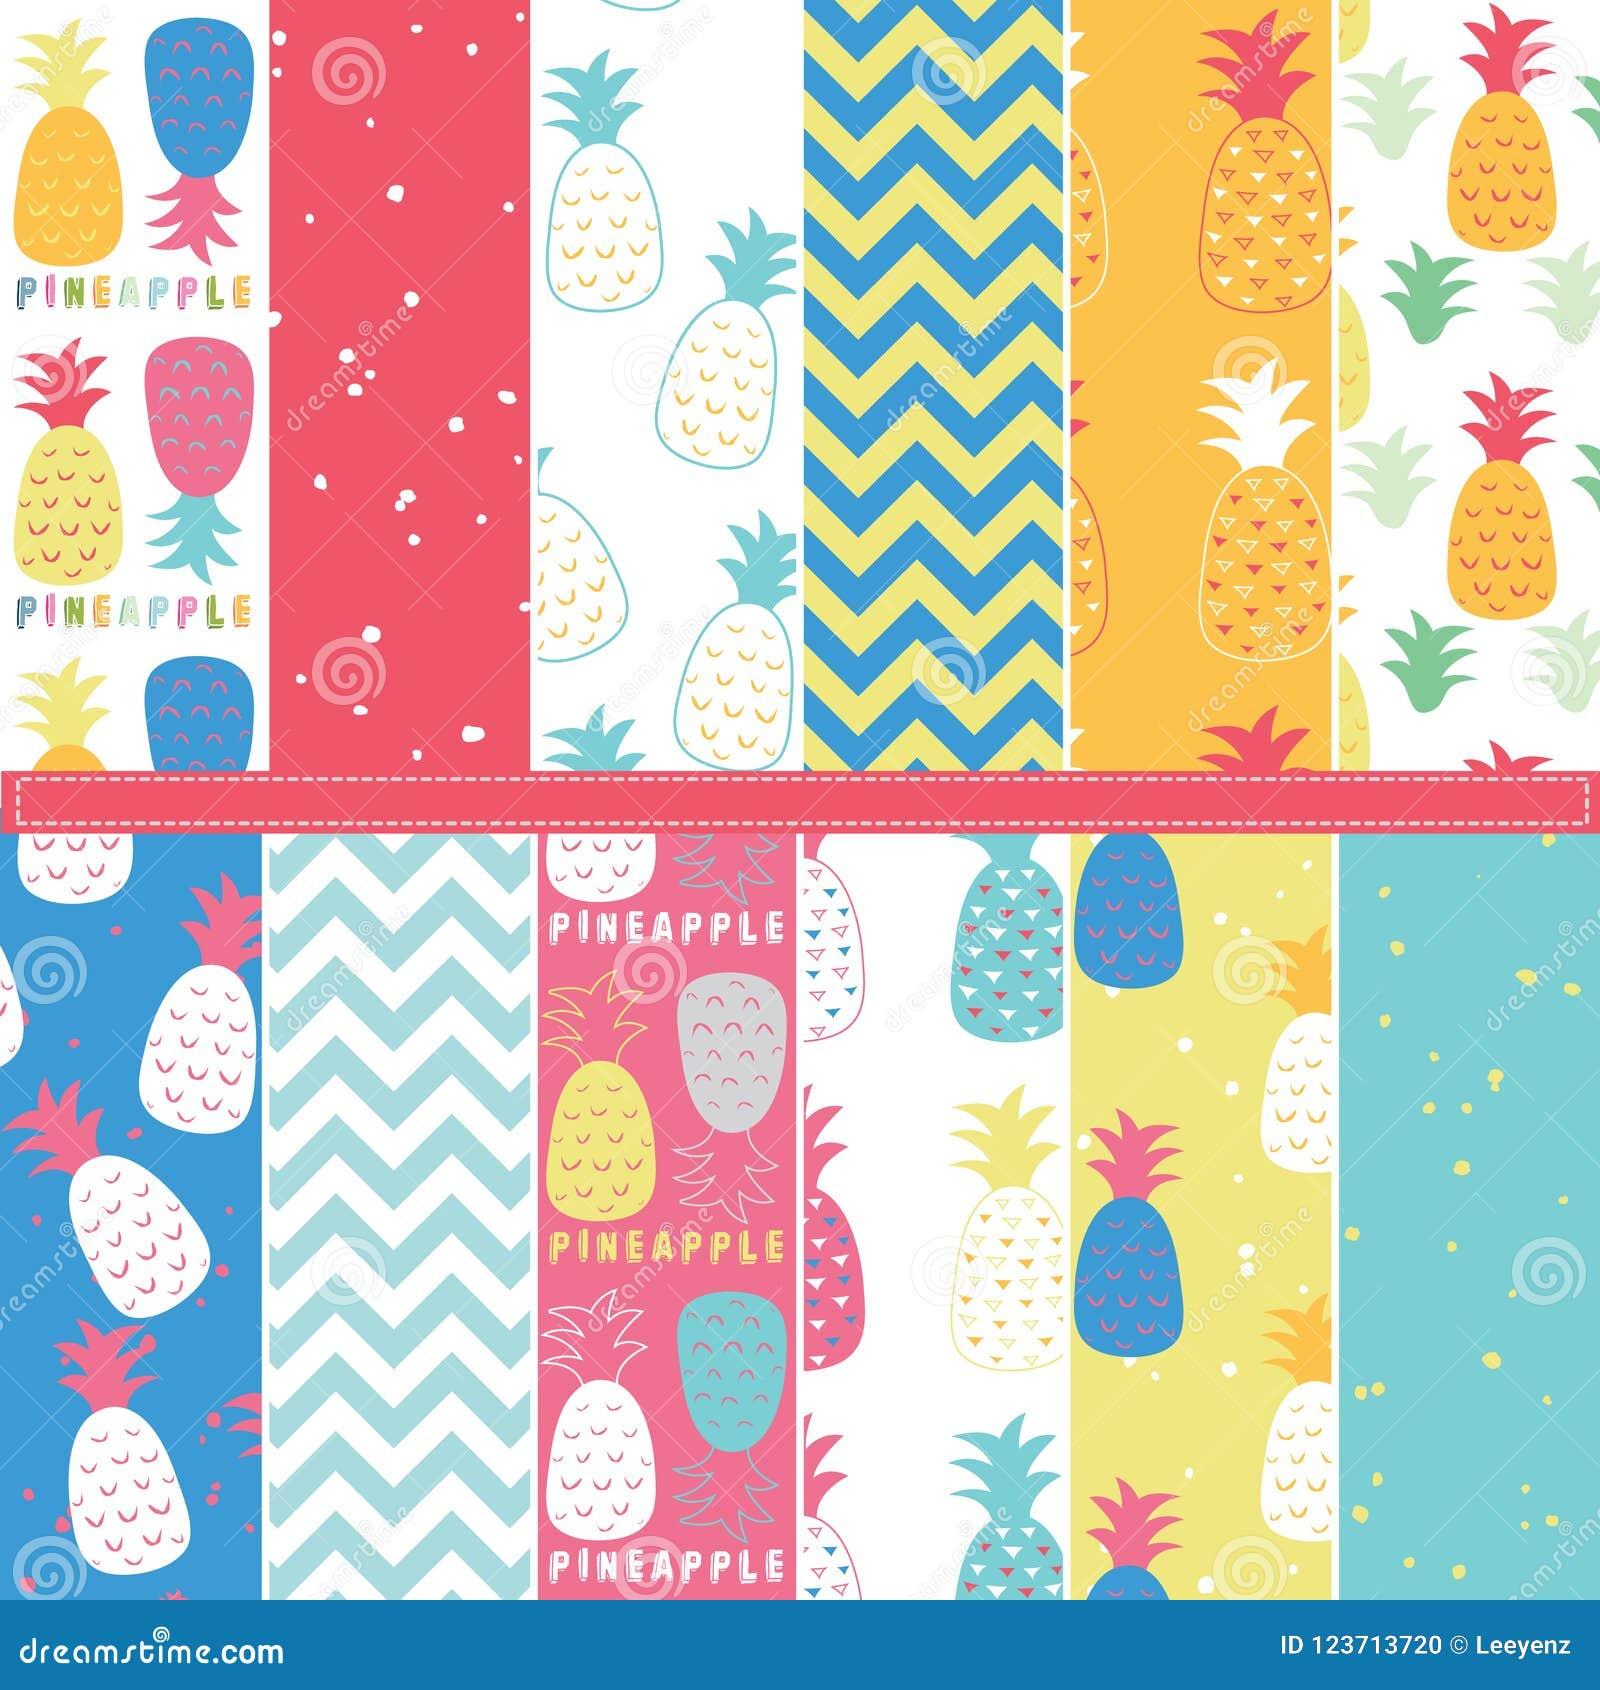 Pineapple Digital Paper Elements Stock Vector - Illustration